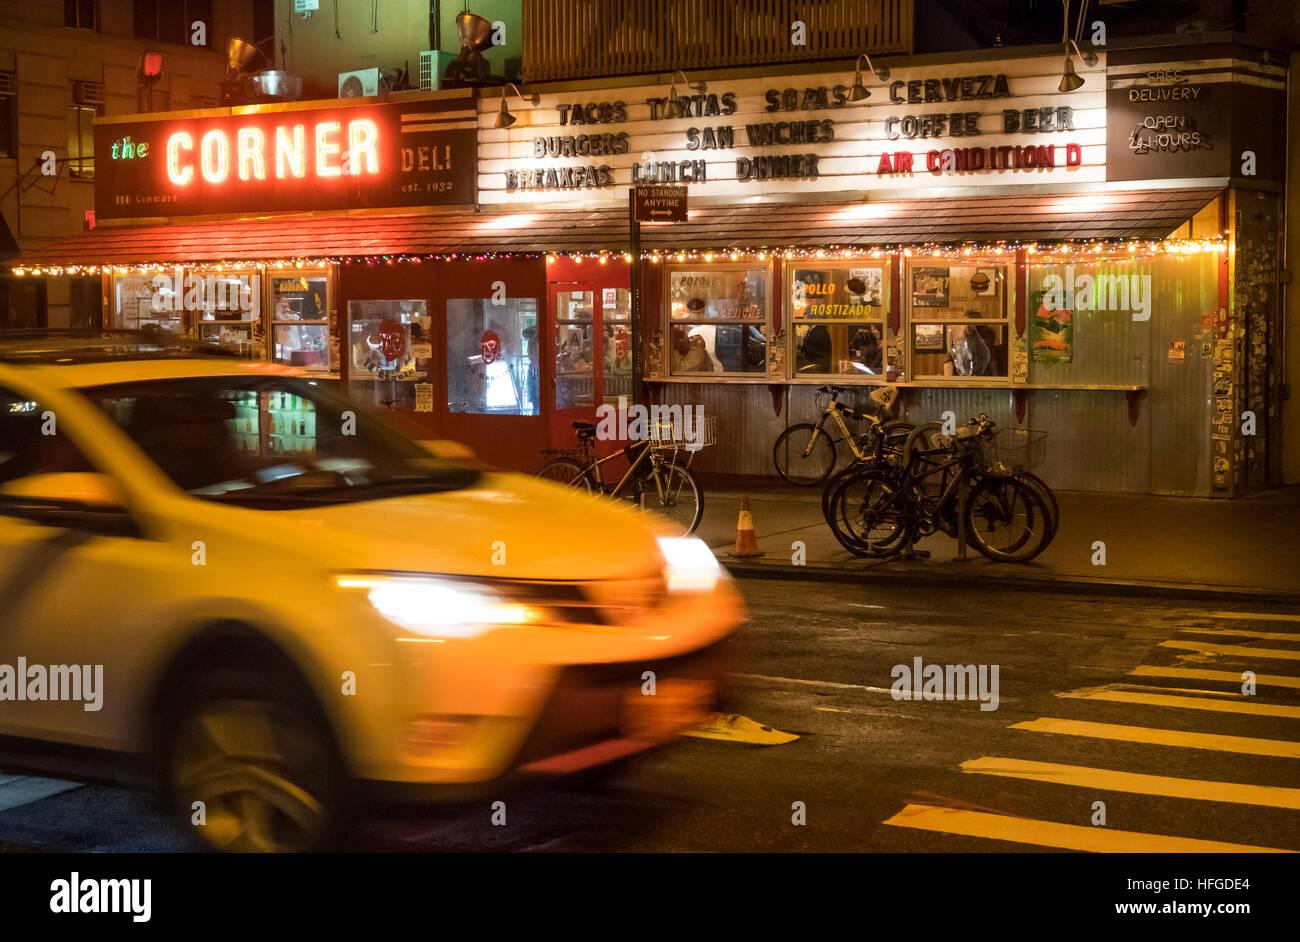 the-corner-deli-la-esquina-a-popular-mex